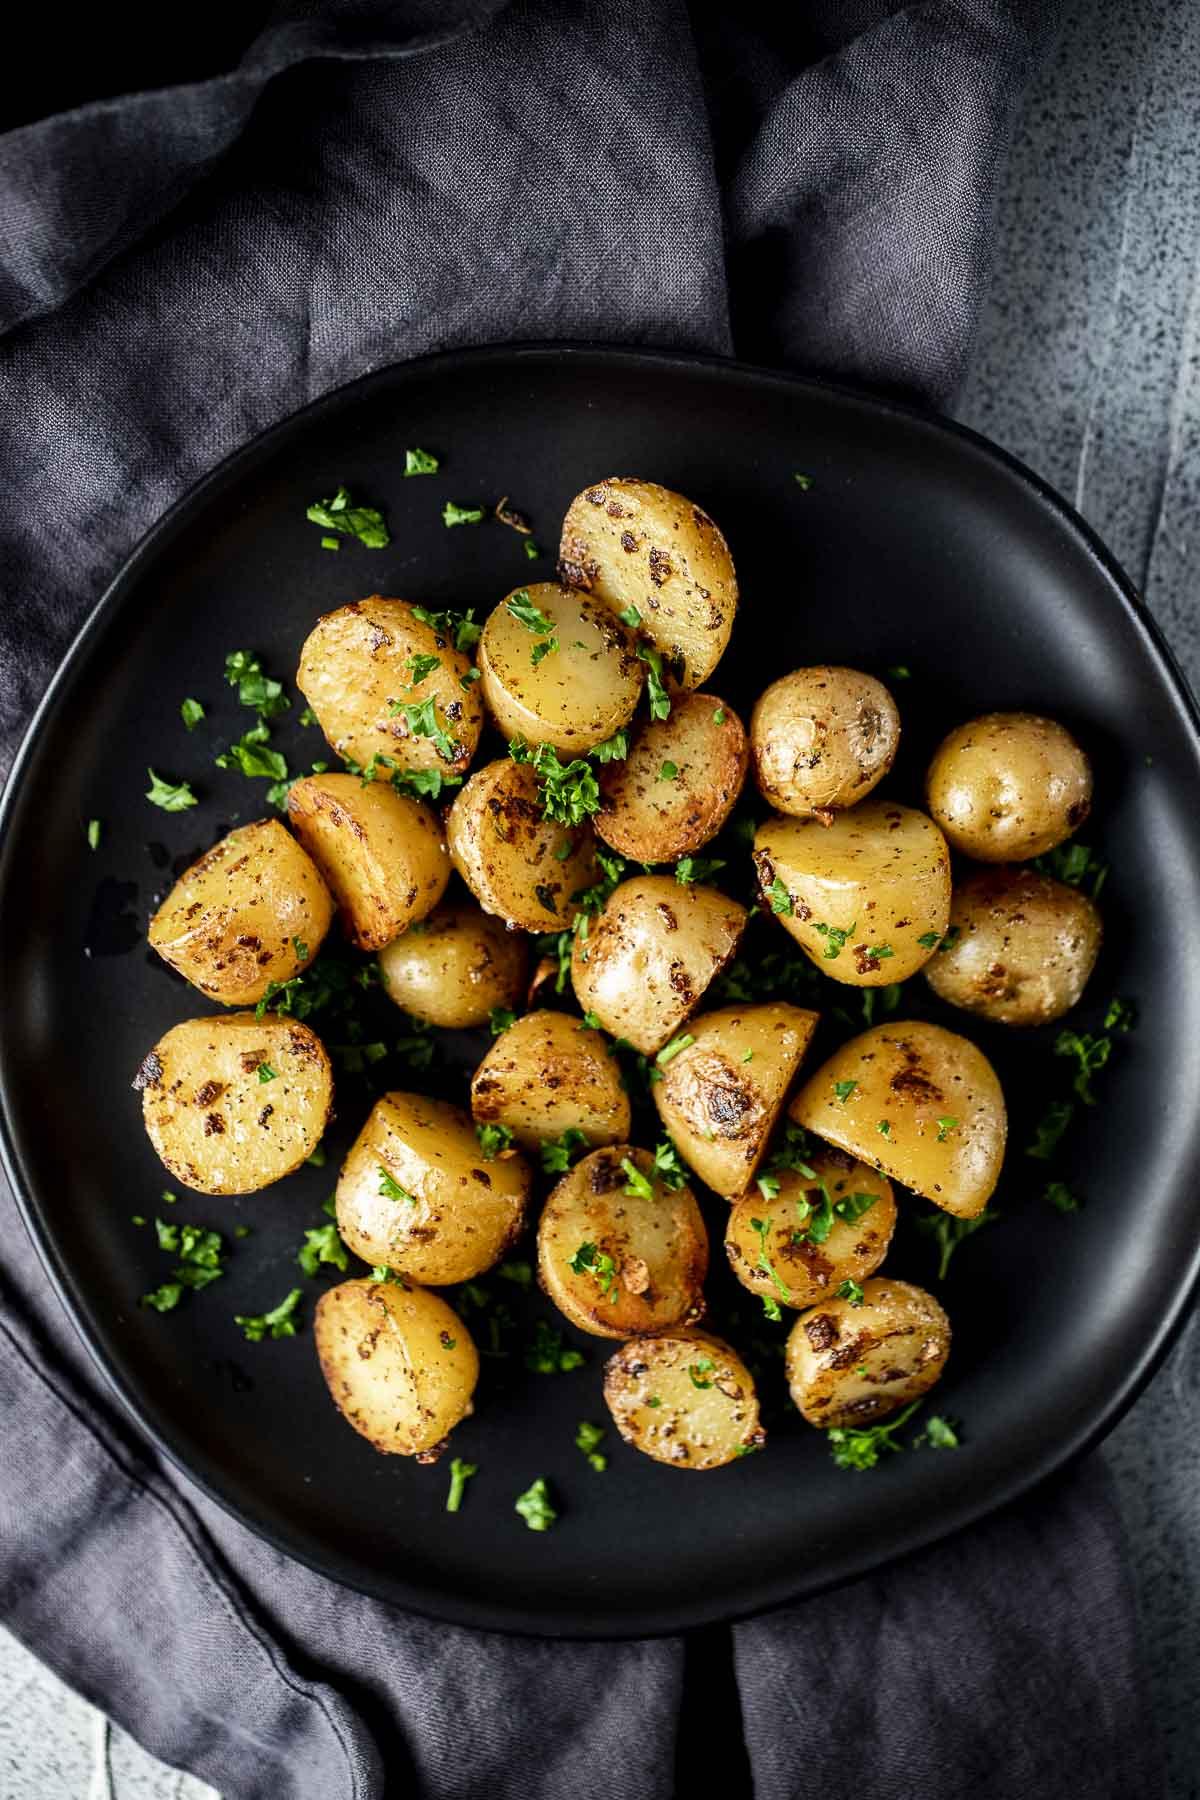 Overhead of mini sous vide potatoes arranged on a black plate.